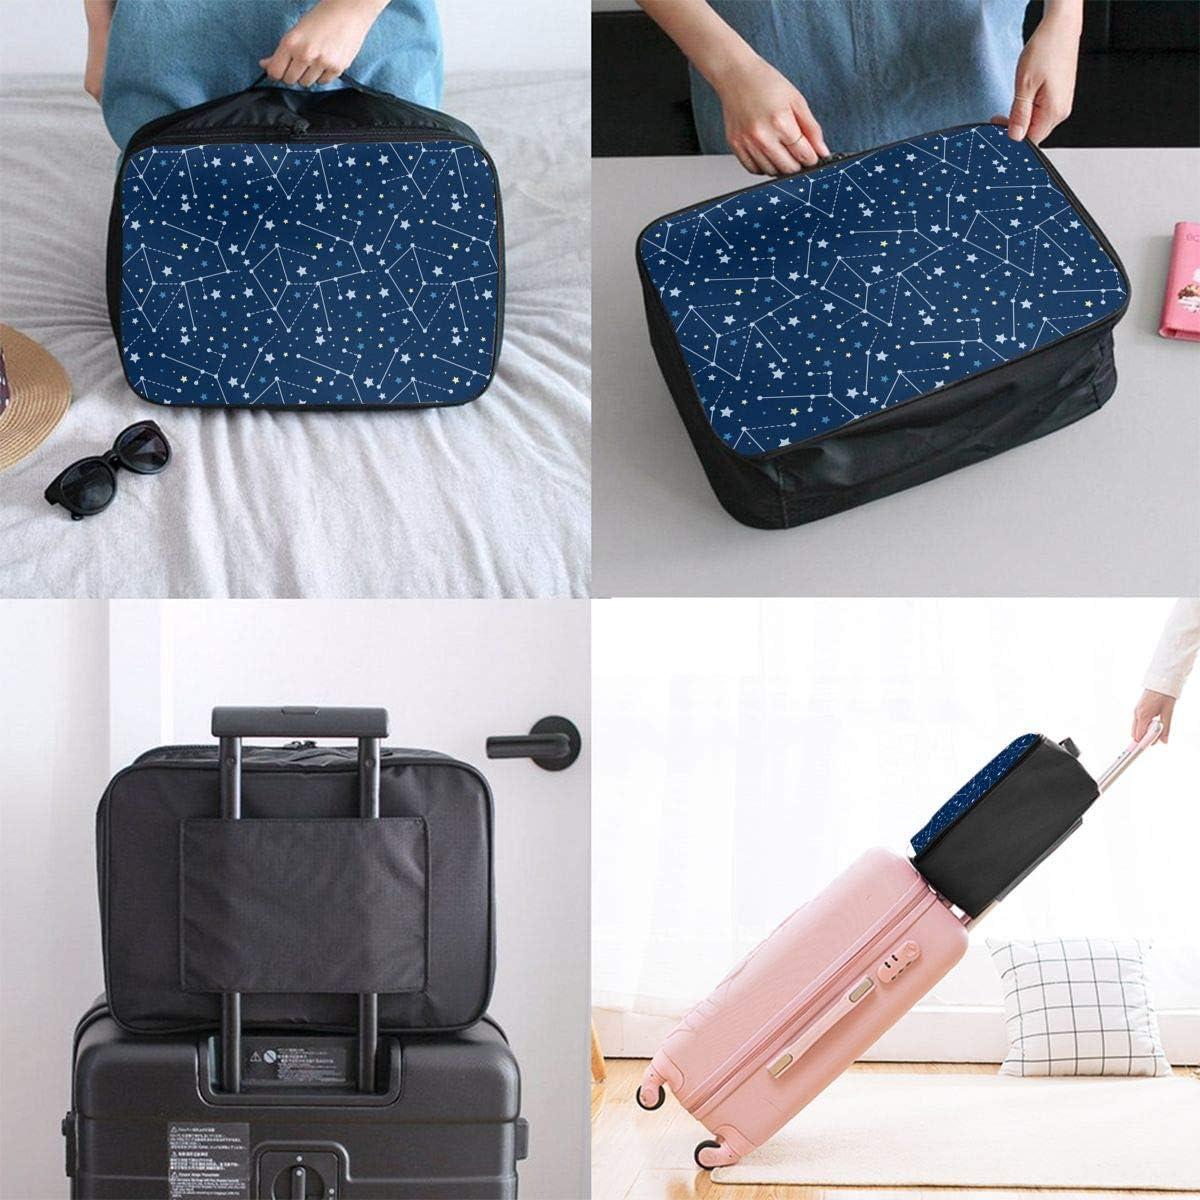 Galaxy Star Travel Carry-on Luggage Weekender Bag Overnight Tote Flight Duffel In Trolley Handle